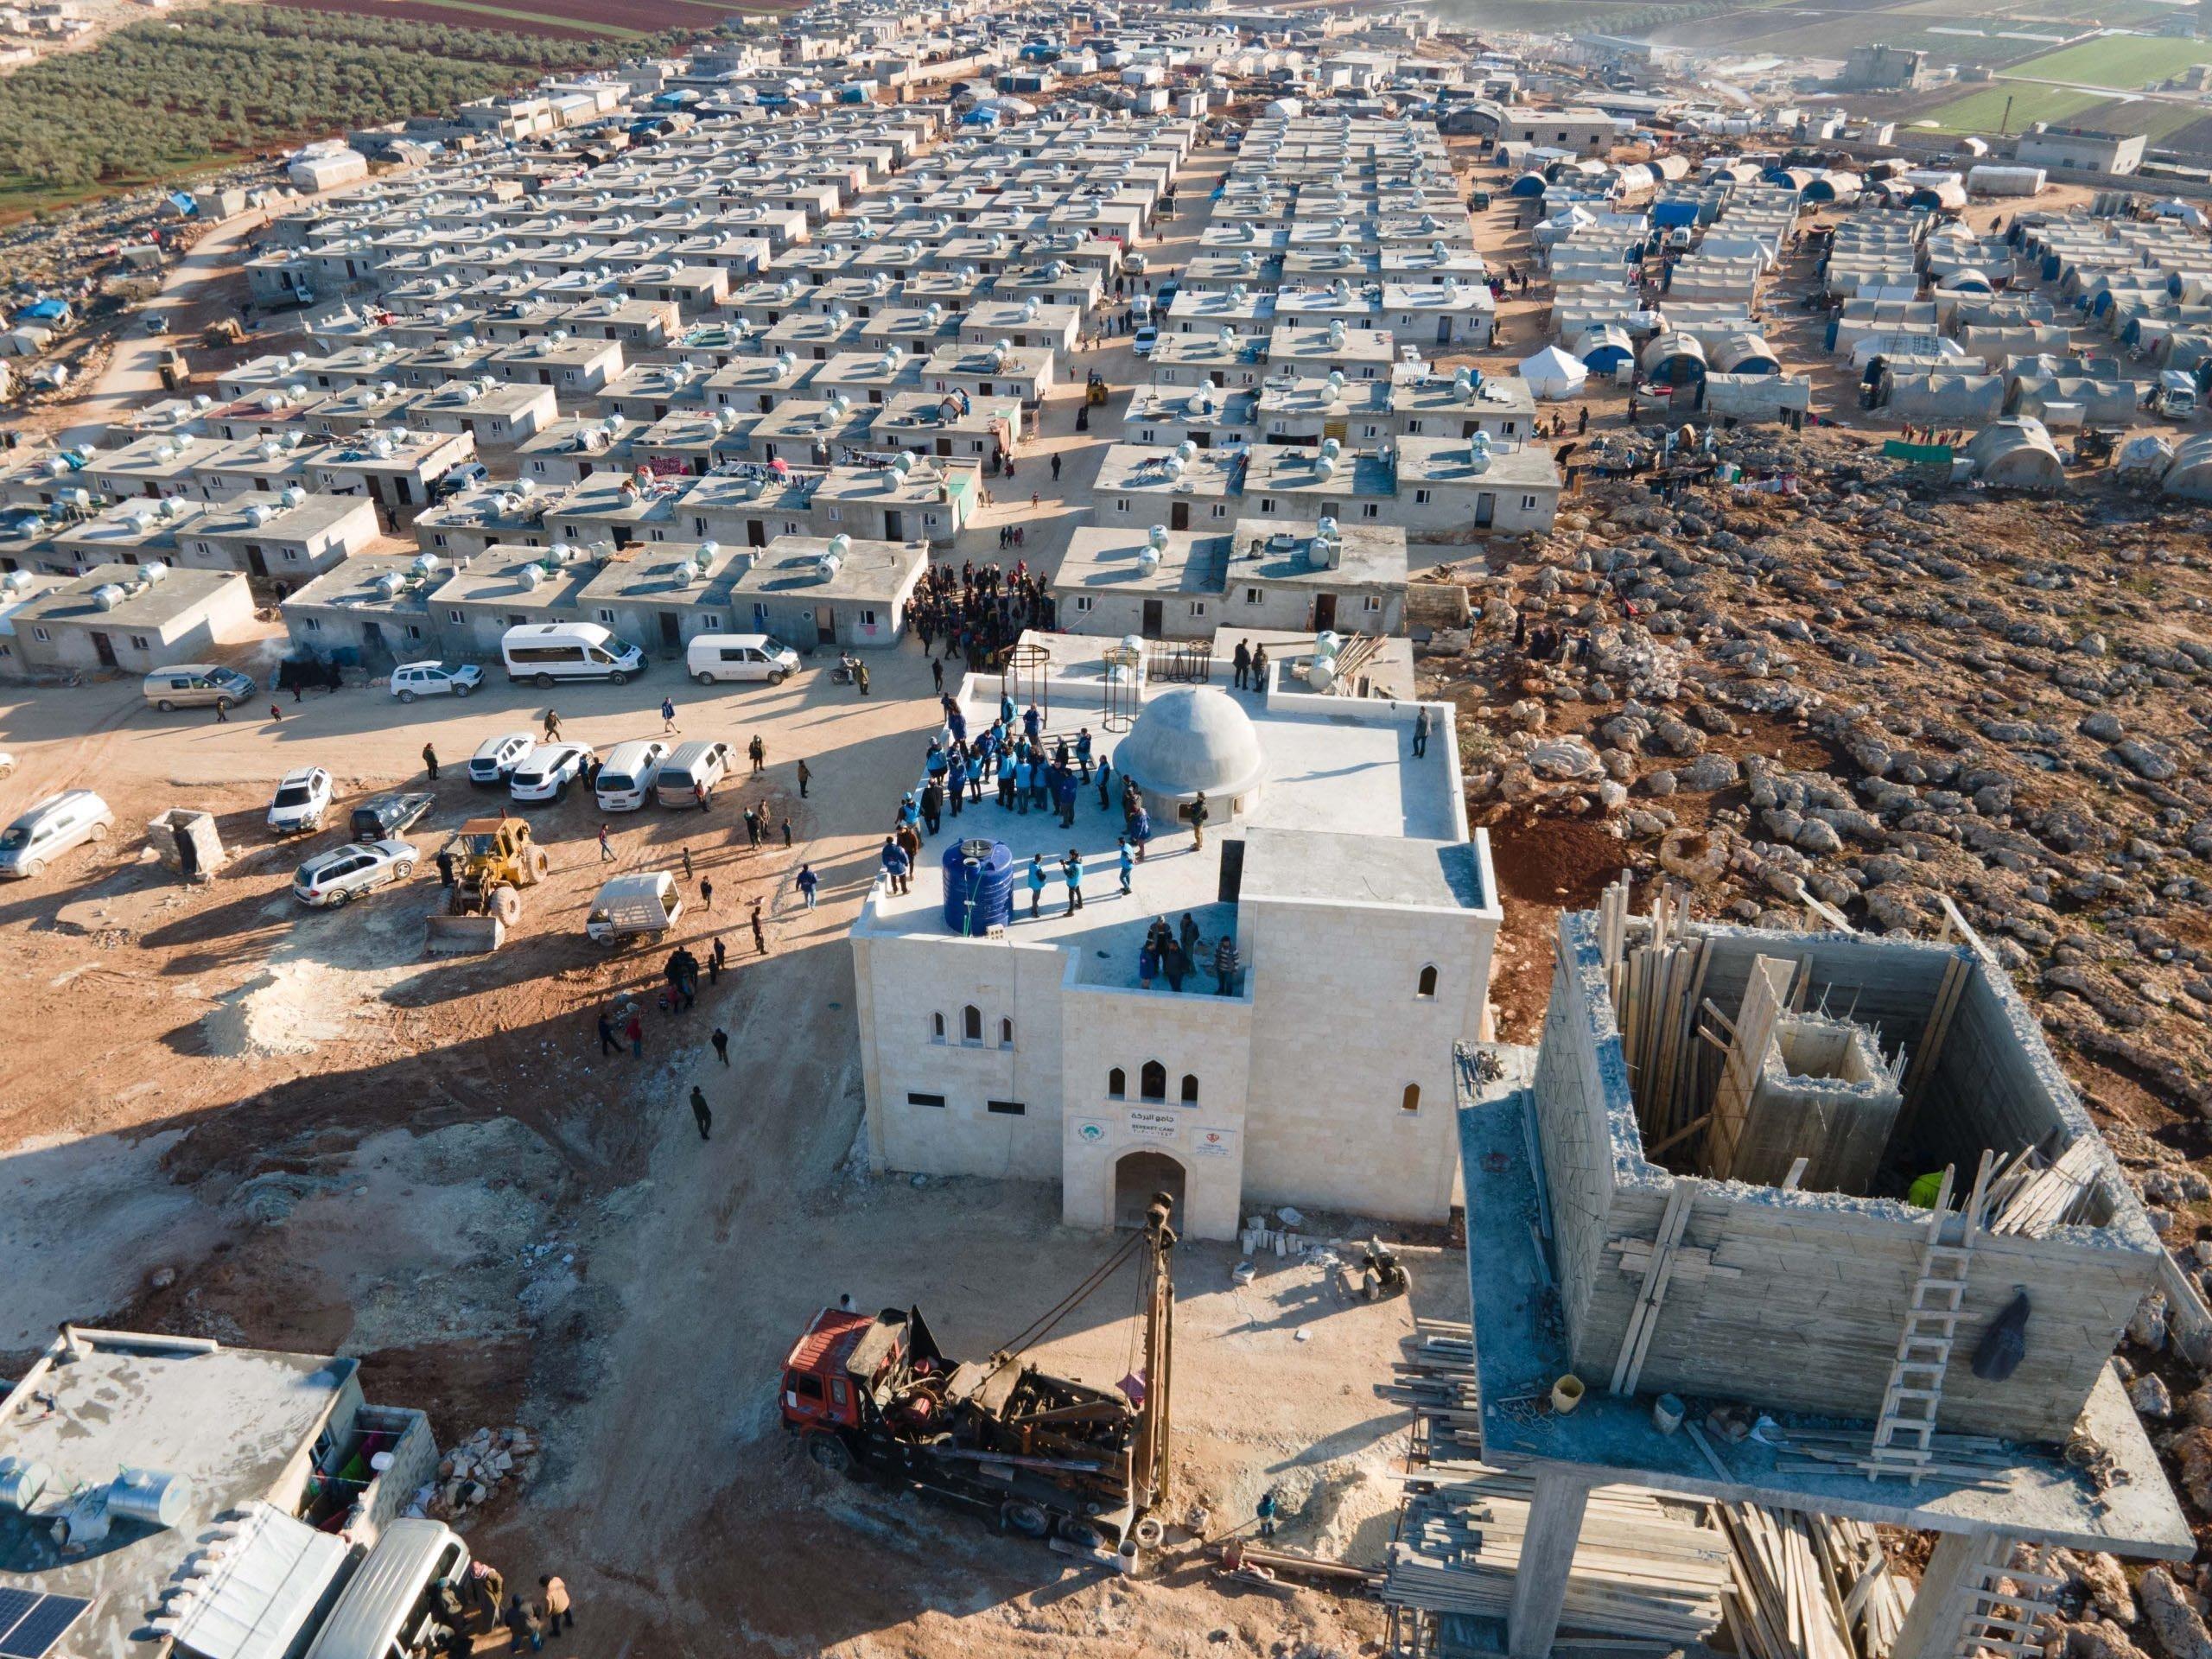 Turkey-built briquette houses, Idlib, Syria, March 11, 2021 (AA)